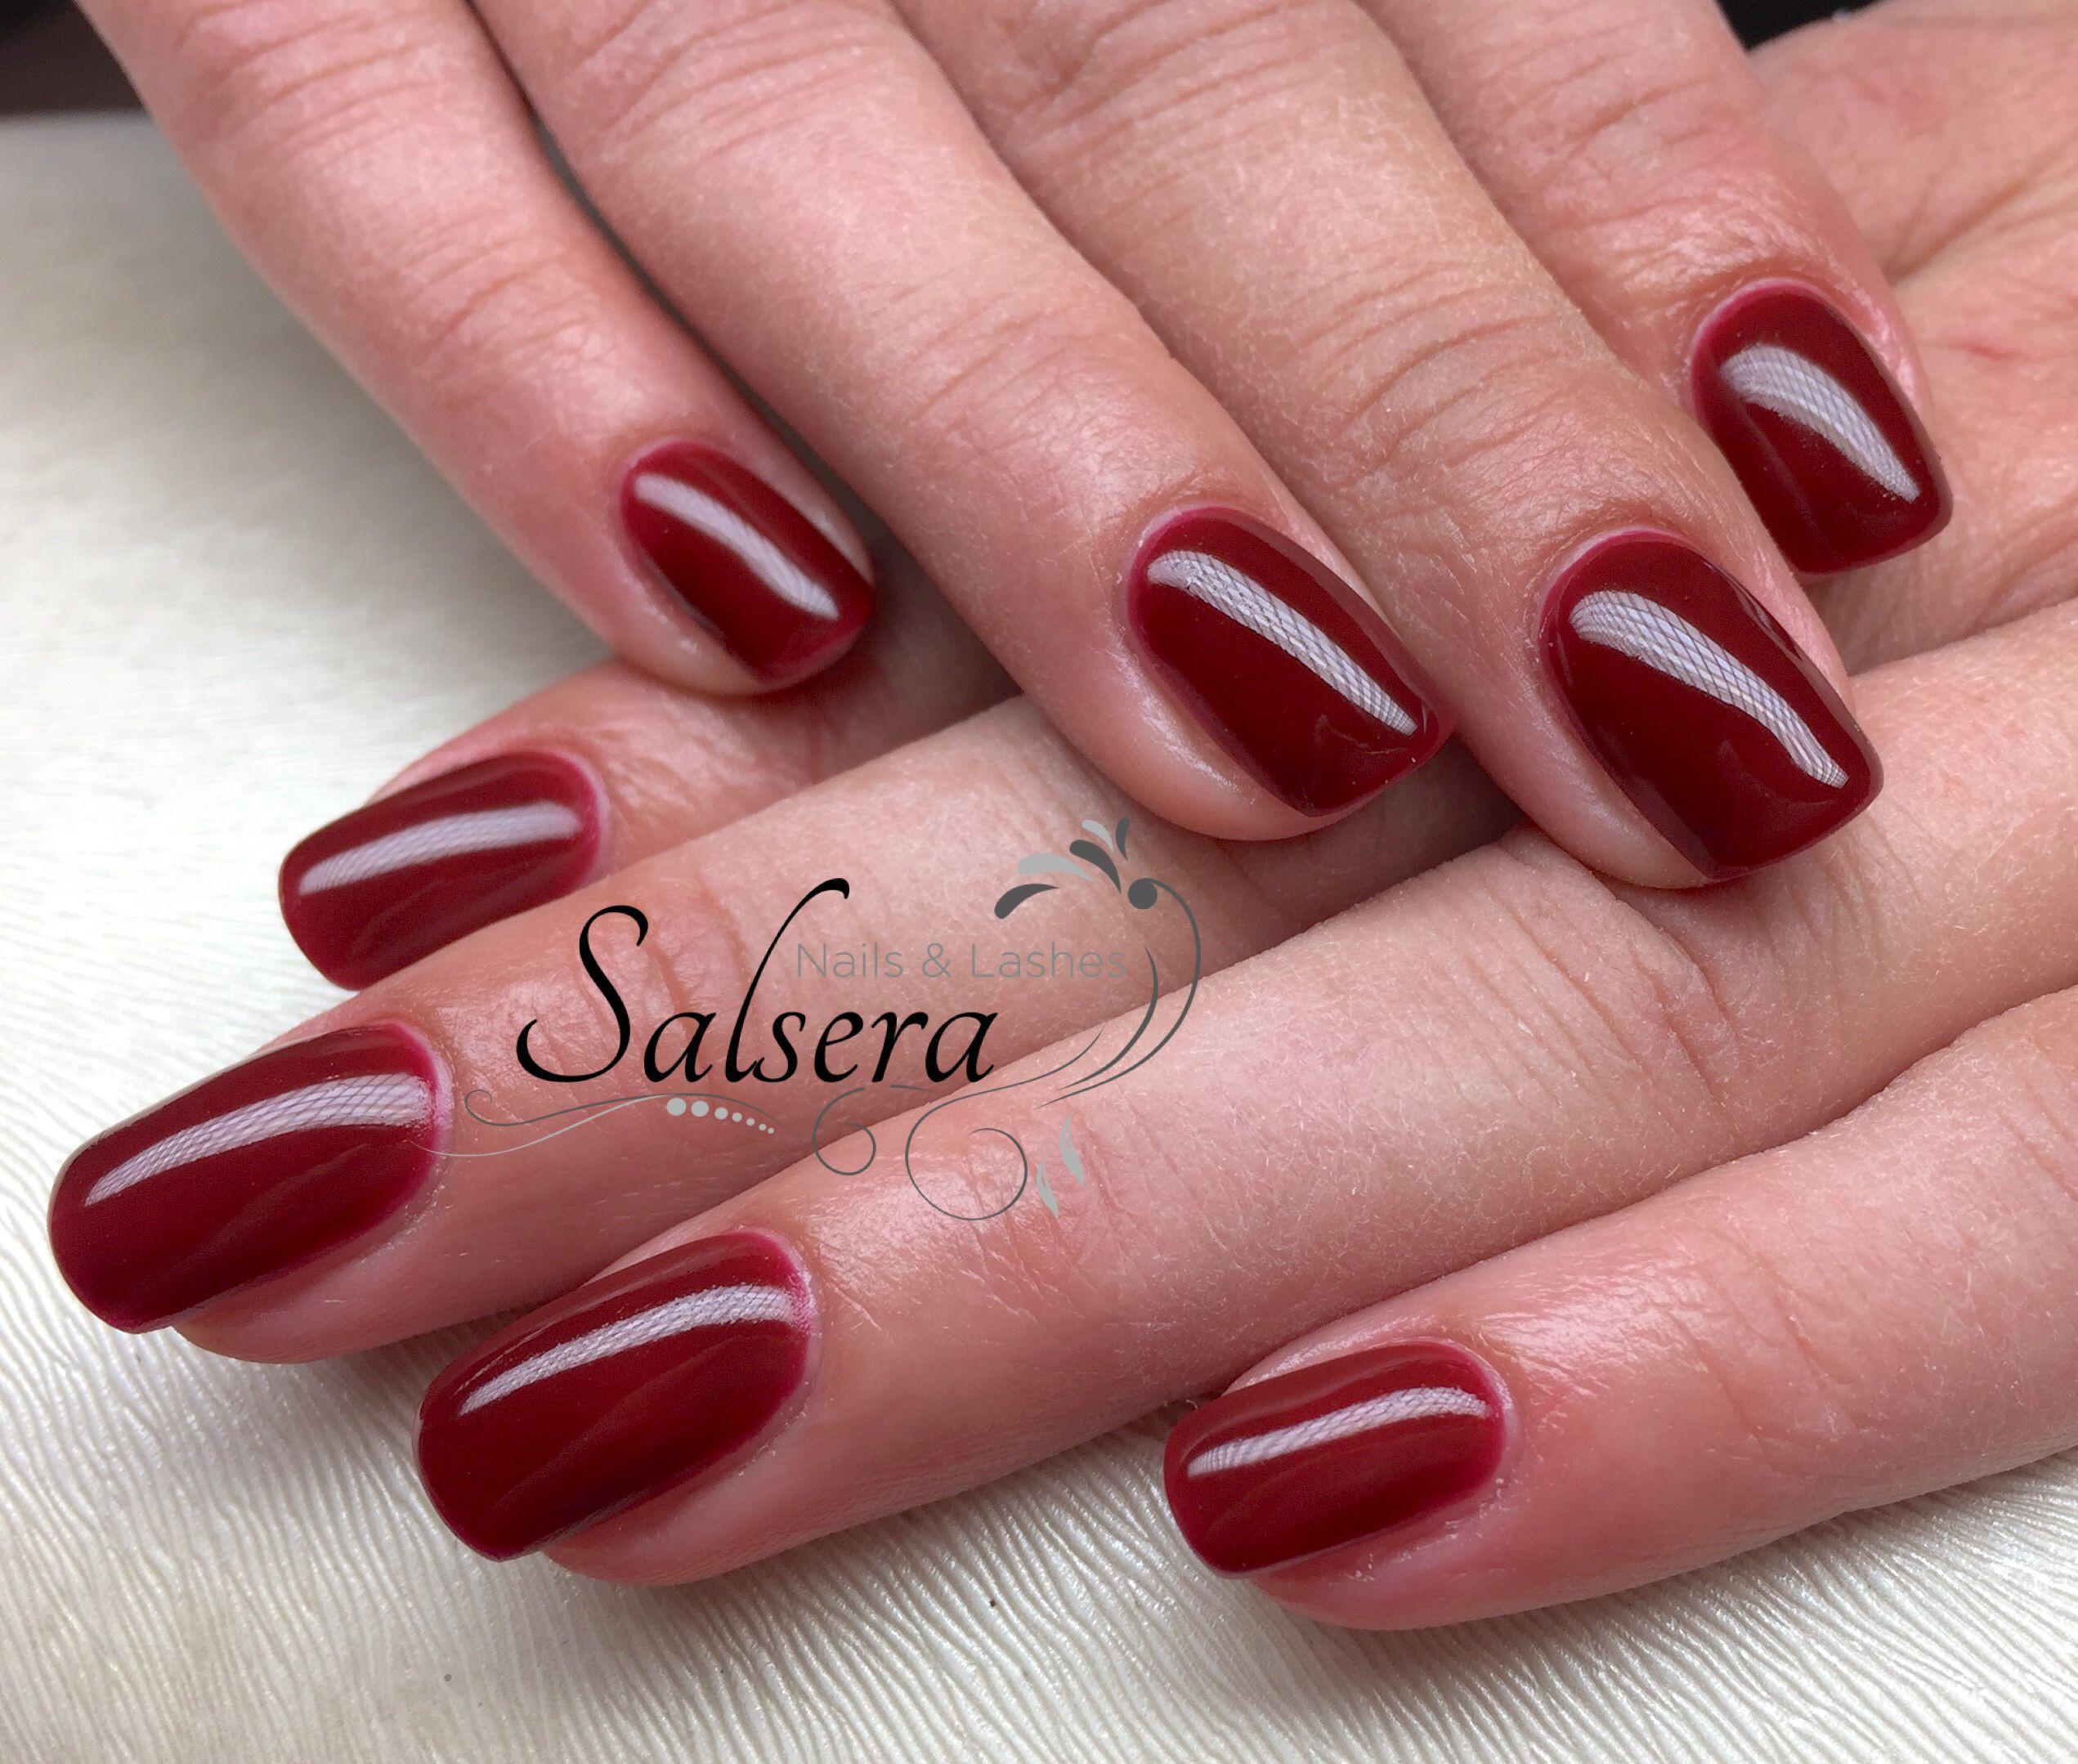 Schöne Nageldesign  Nails Nägel Nageldesign Schöne Nägel Fullcover Rot red